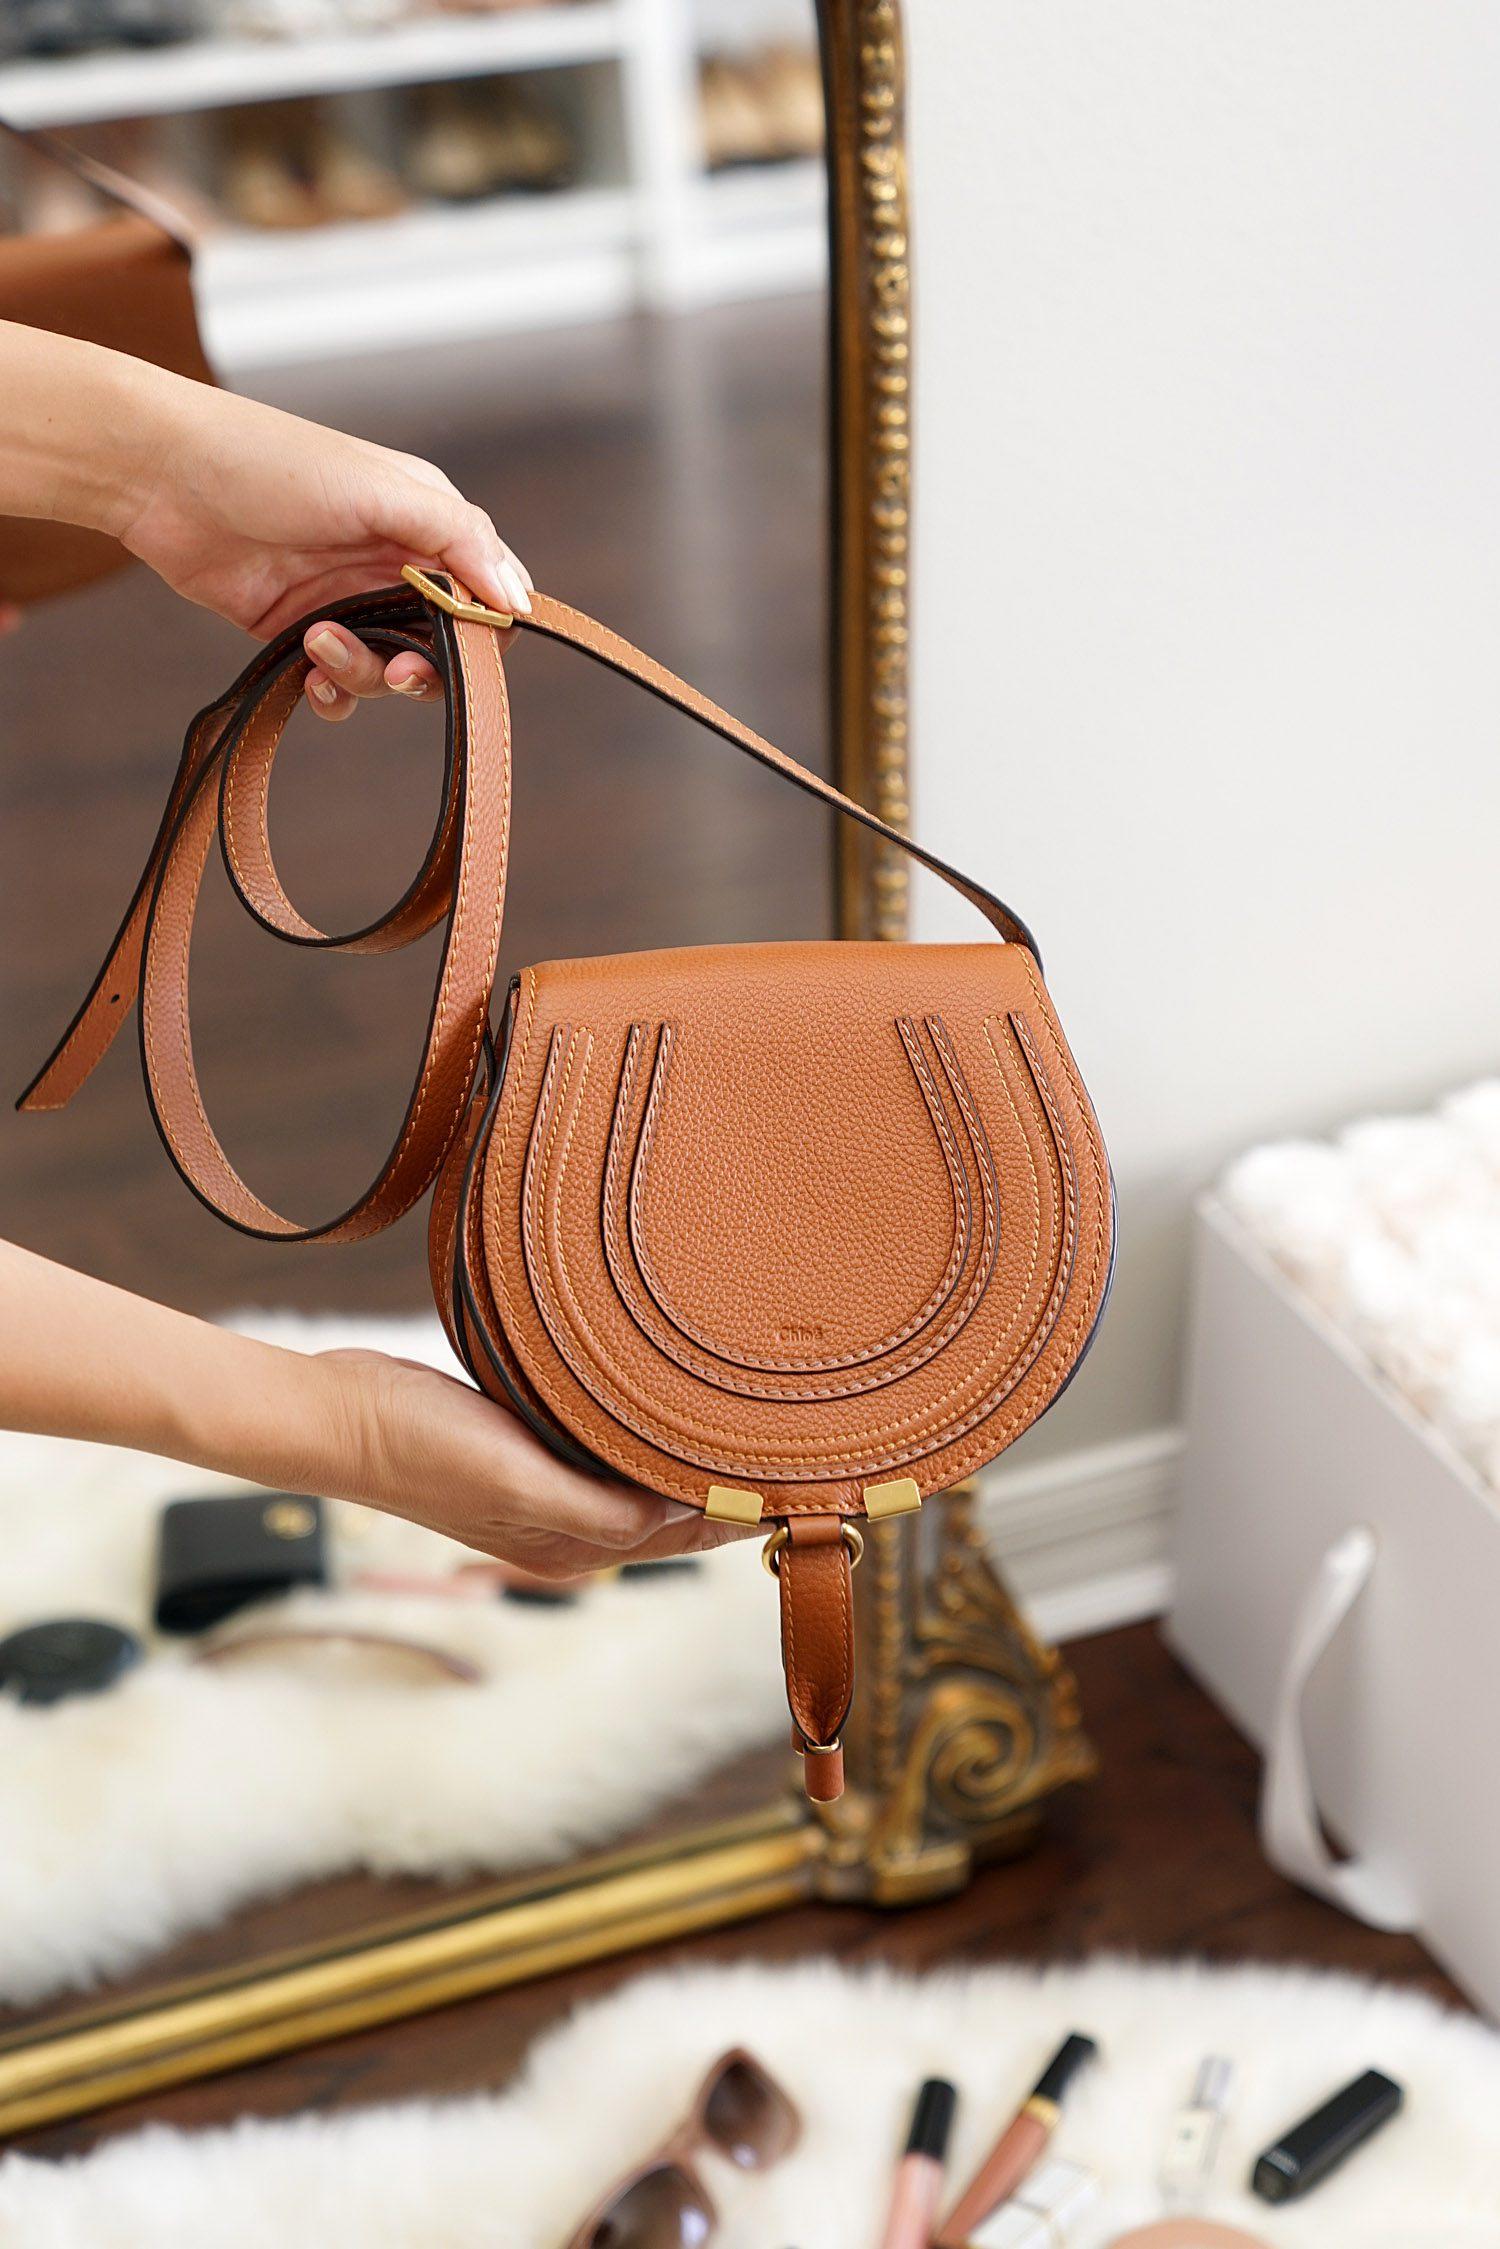 Chloe Mini Marcie Bag Review The Beauty Look Book